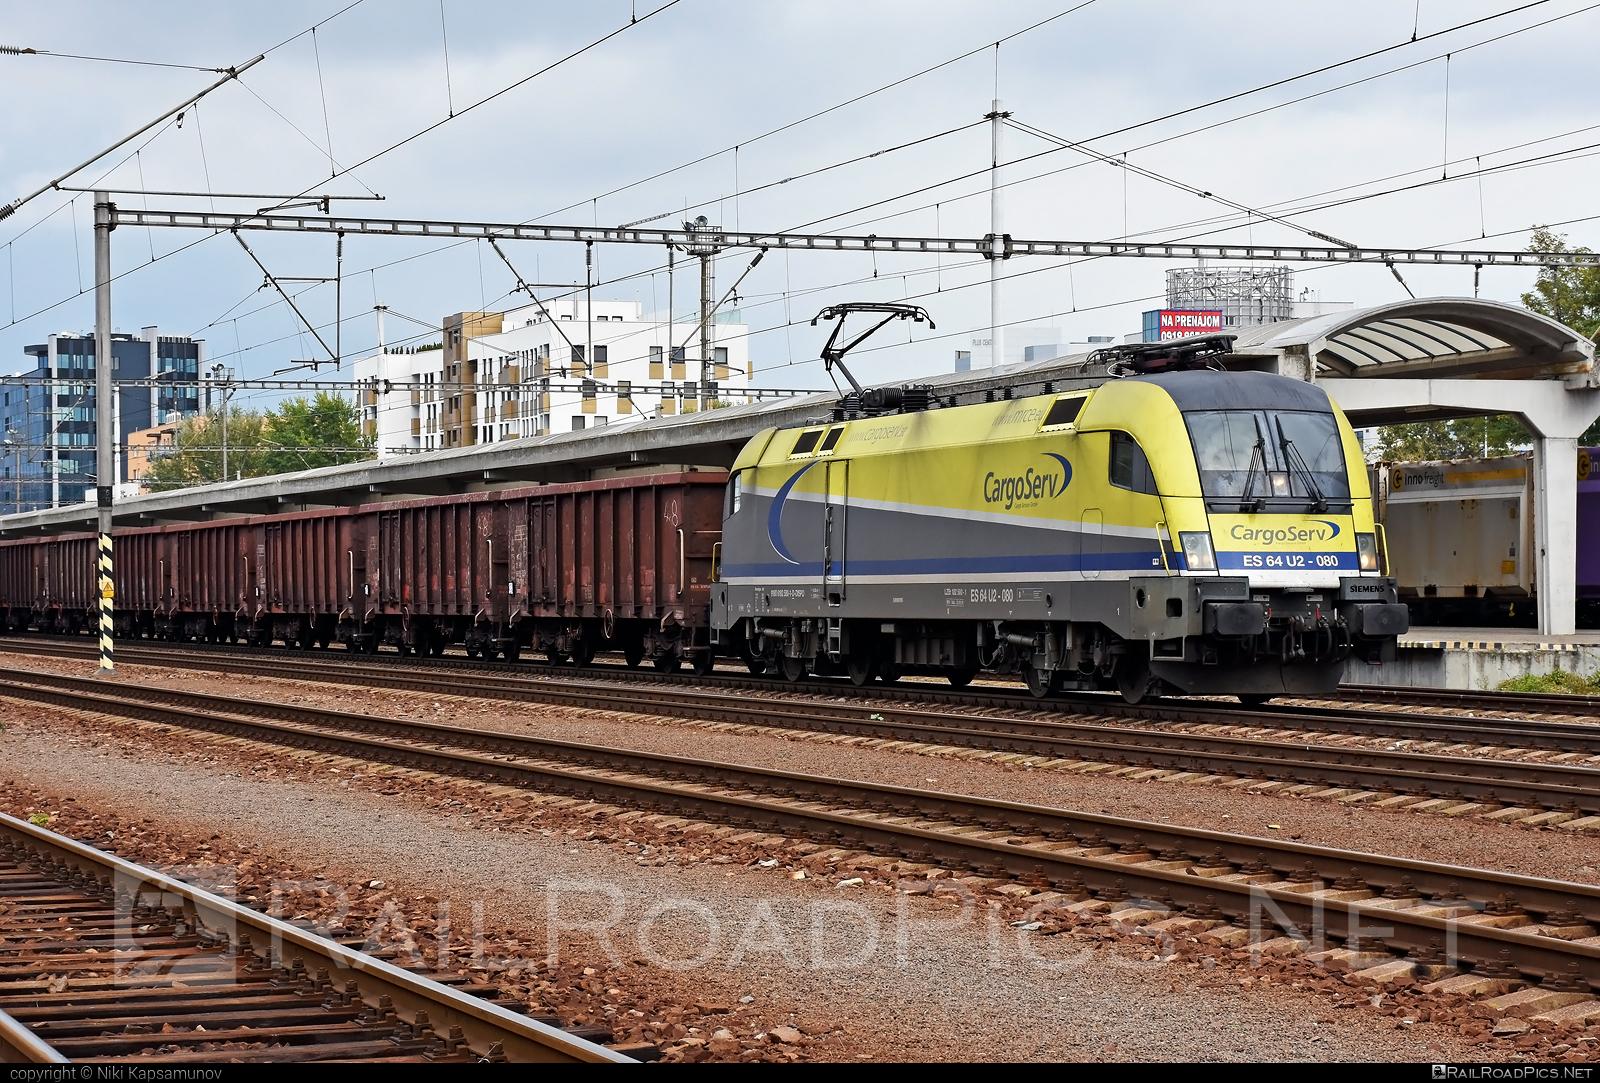 Siemens ES 64 U2 - 182 580-1 operated by CargoServ GmbH #cargoserv #dispolok #es64 #es64u #es64u2 #eurosprinter #mitsuirailcapitaleurope #mitsuirailcapitaleuropegmbh #mrce #siemens #siemenses64 #siemenses64u #siemenses64u2 #siemenstaurus #taurus #tauruslocomotive